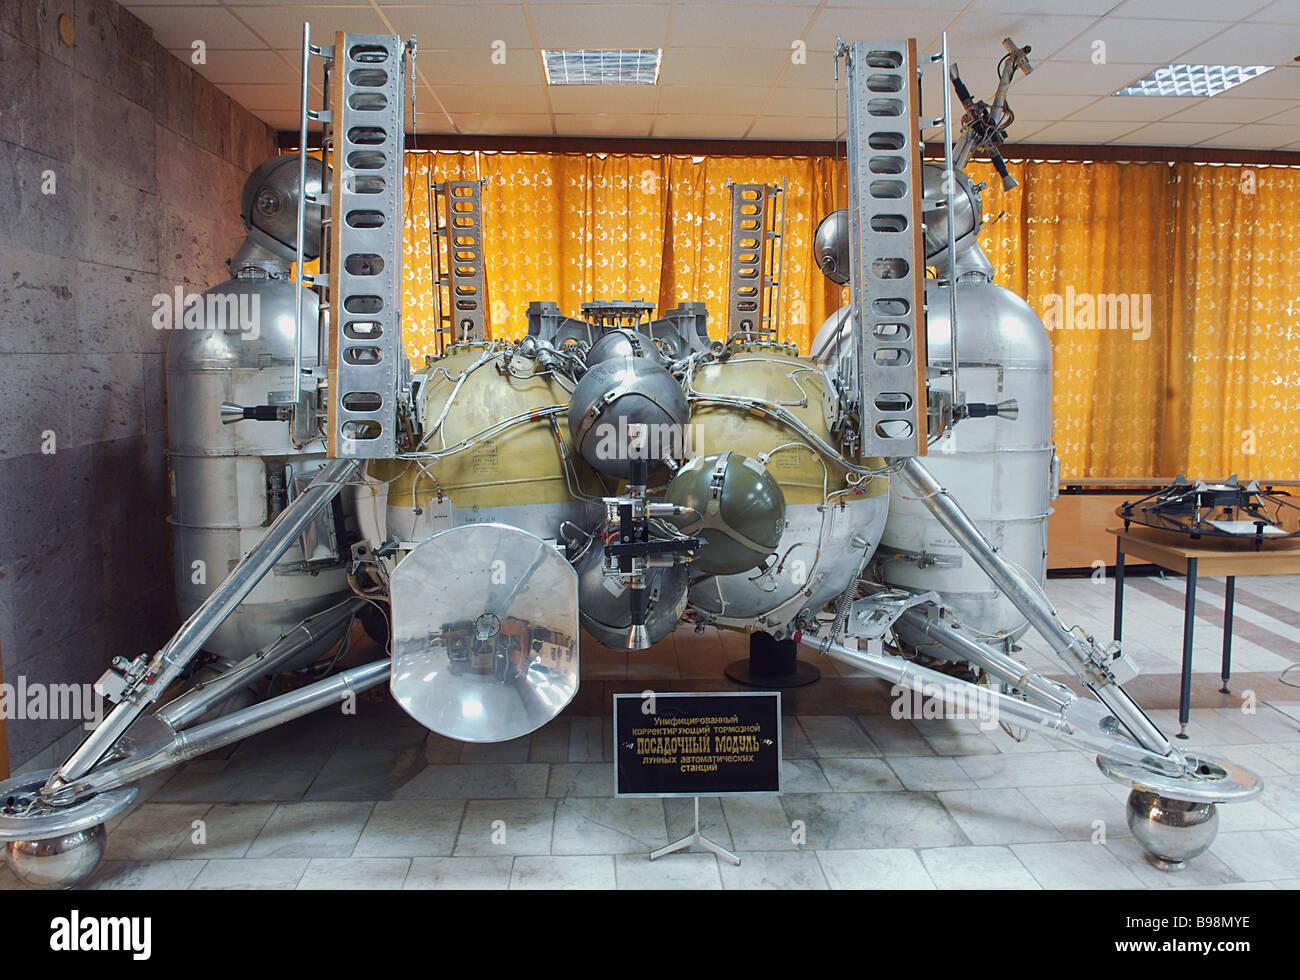 A lander used in lunar probes - Stock Image